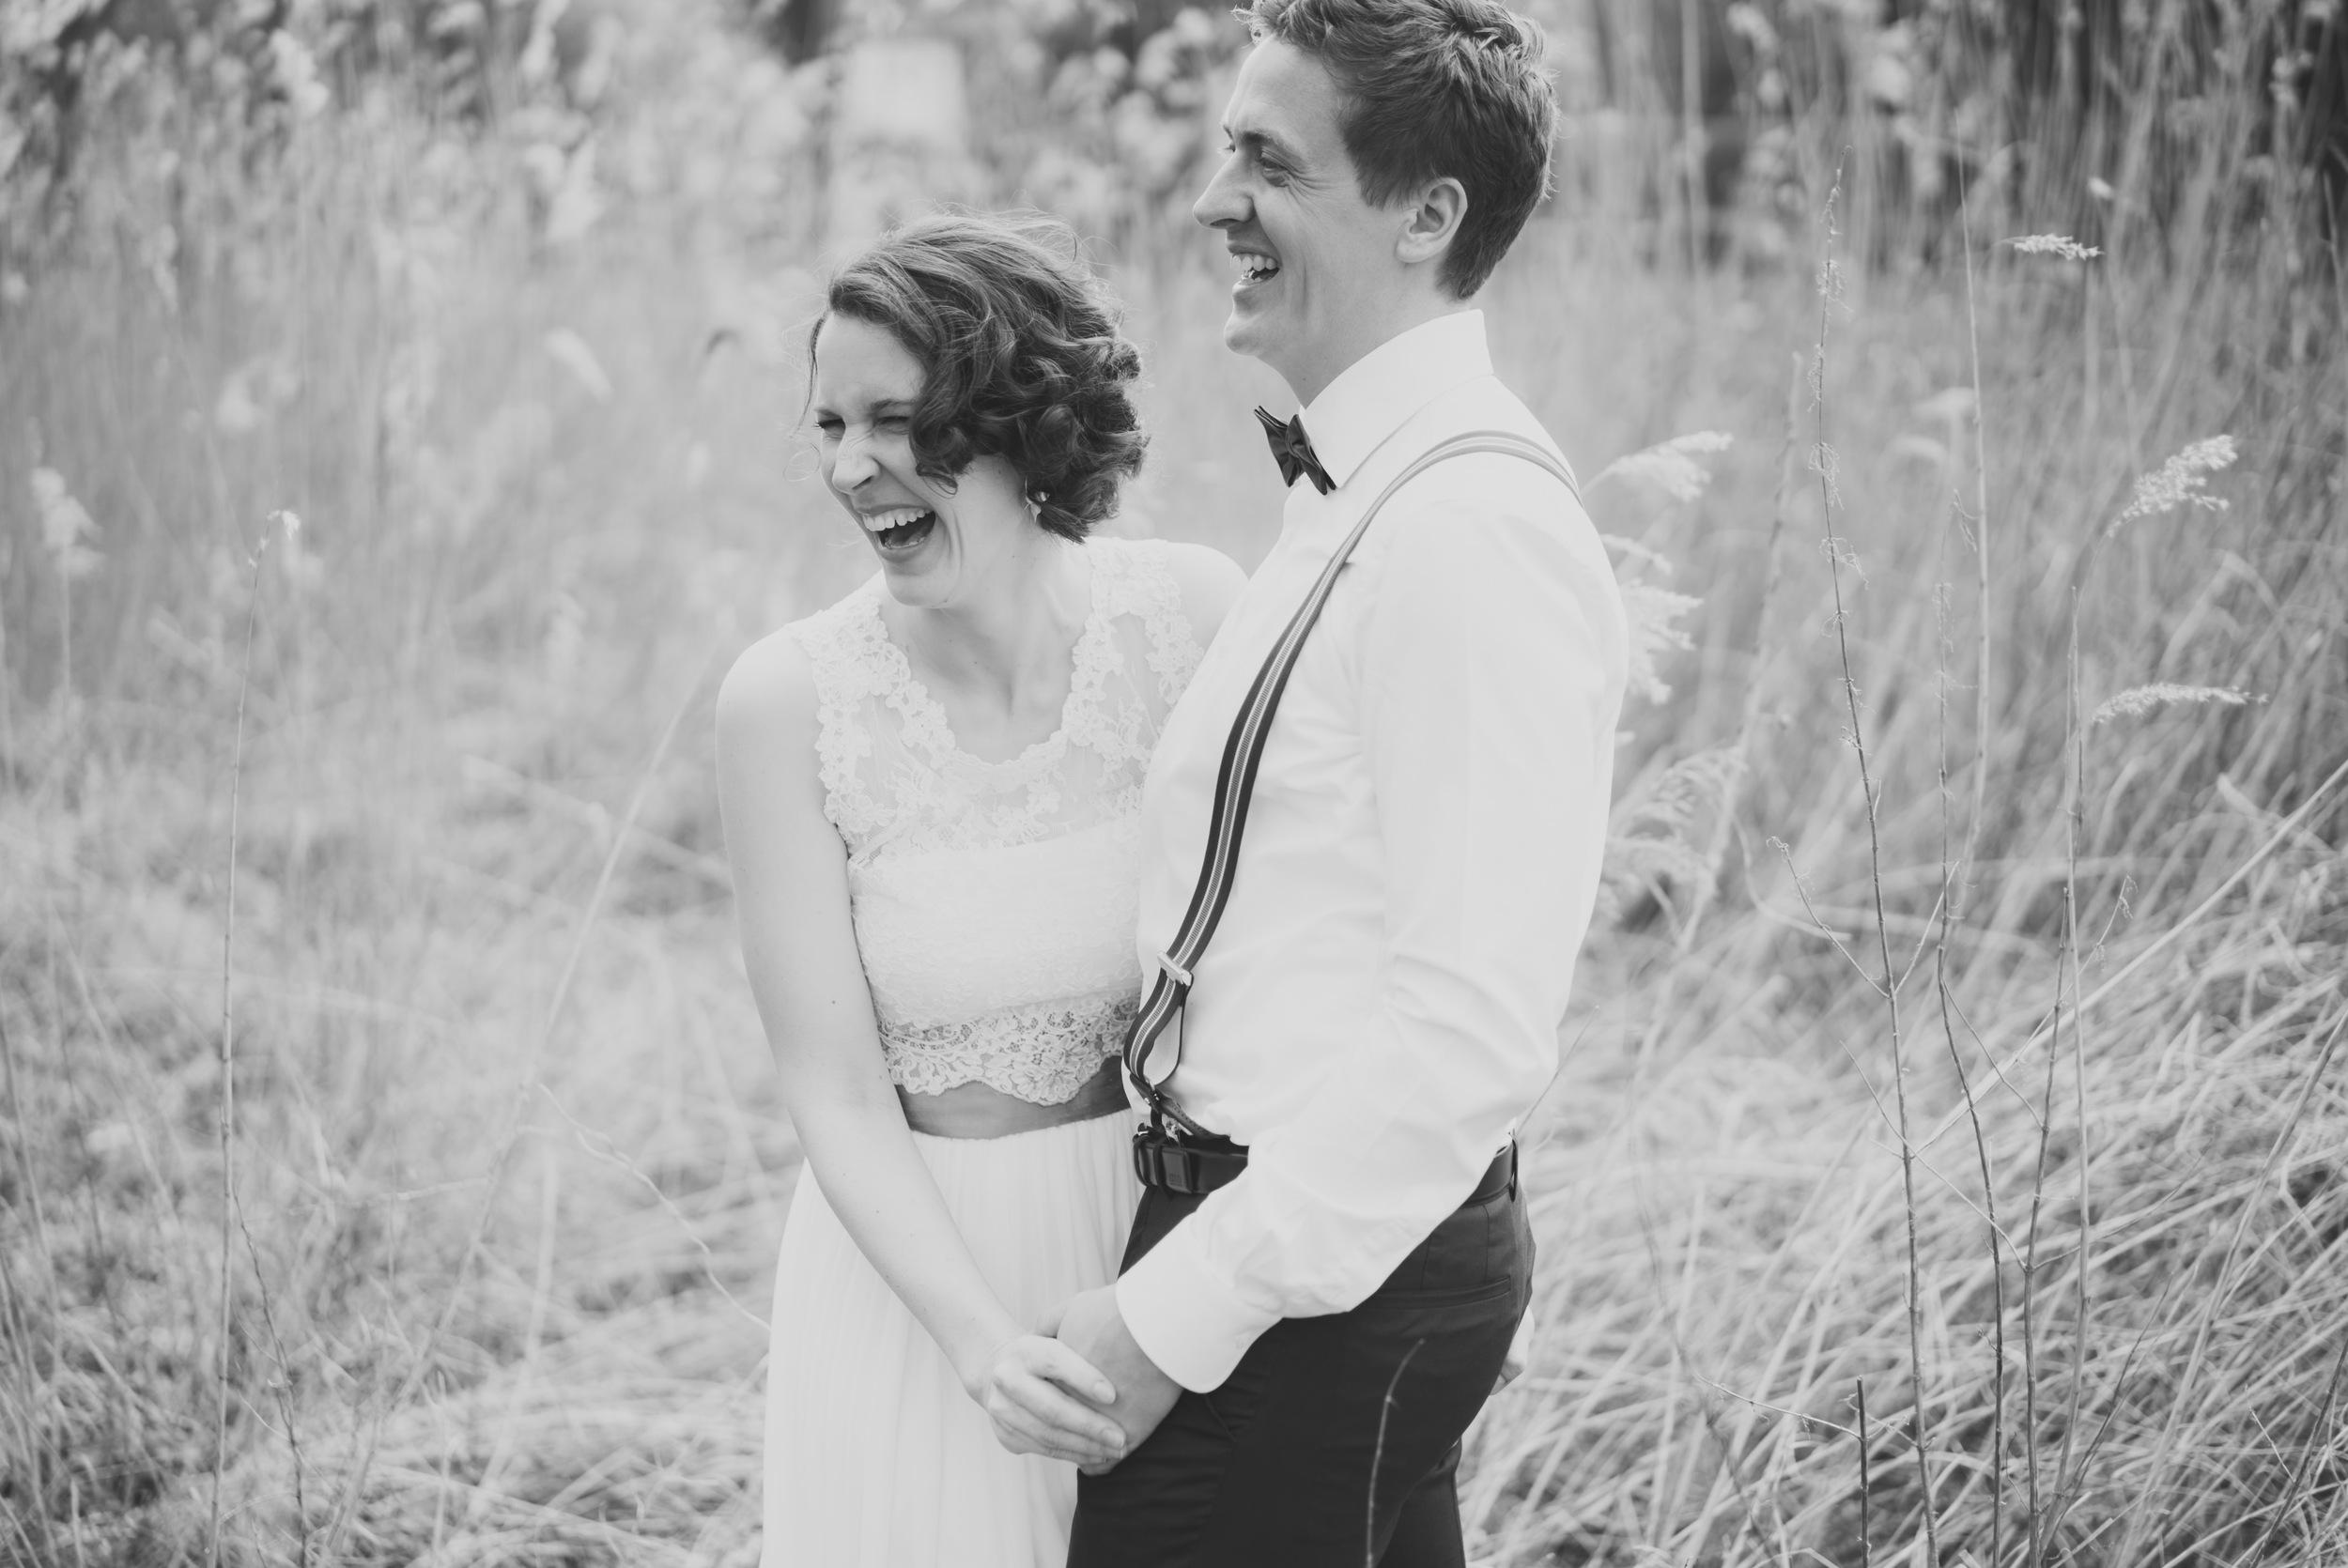 Hochzeitsfotograf-Schlossruine-Hertefeld-Weeze-029.jpg